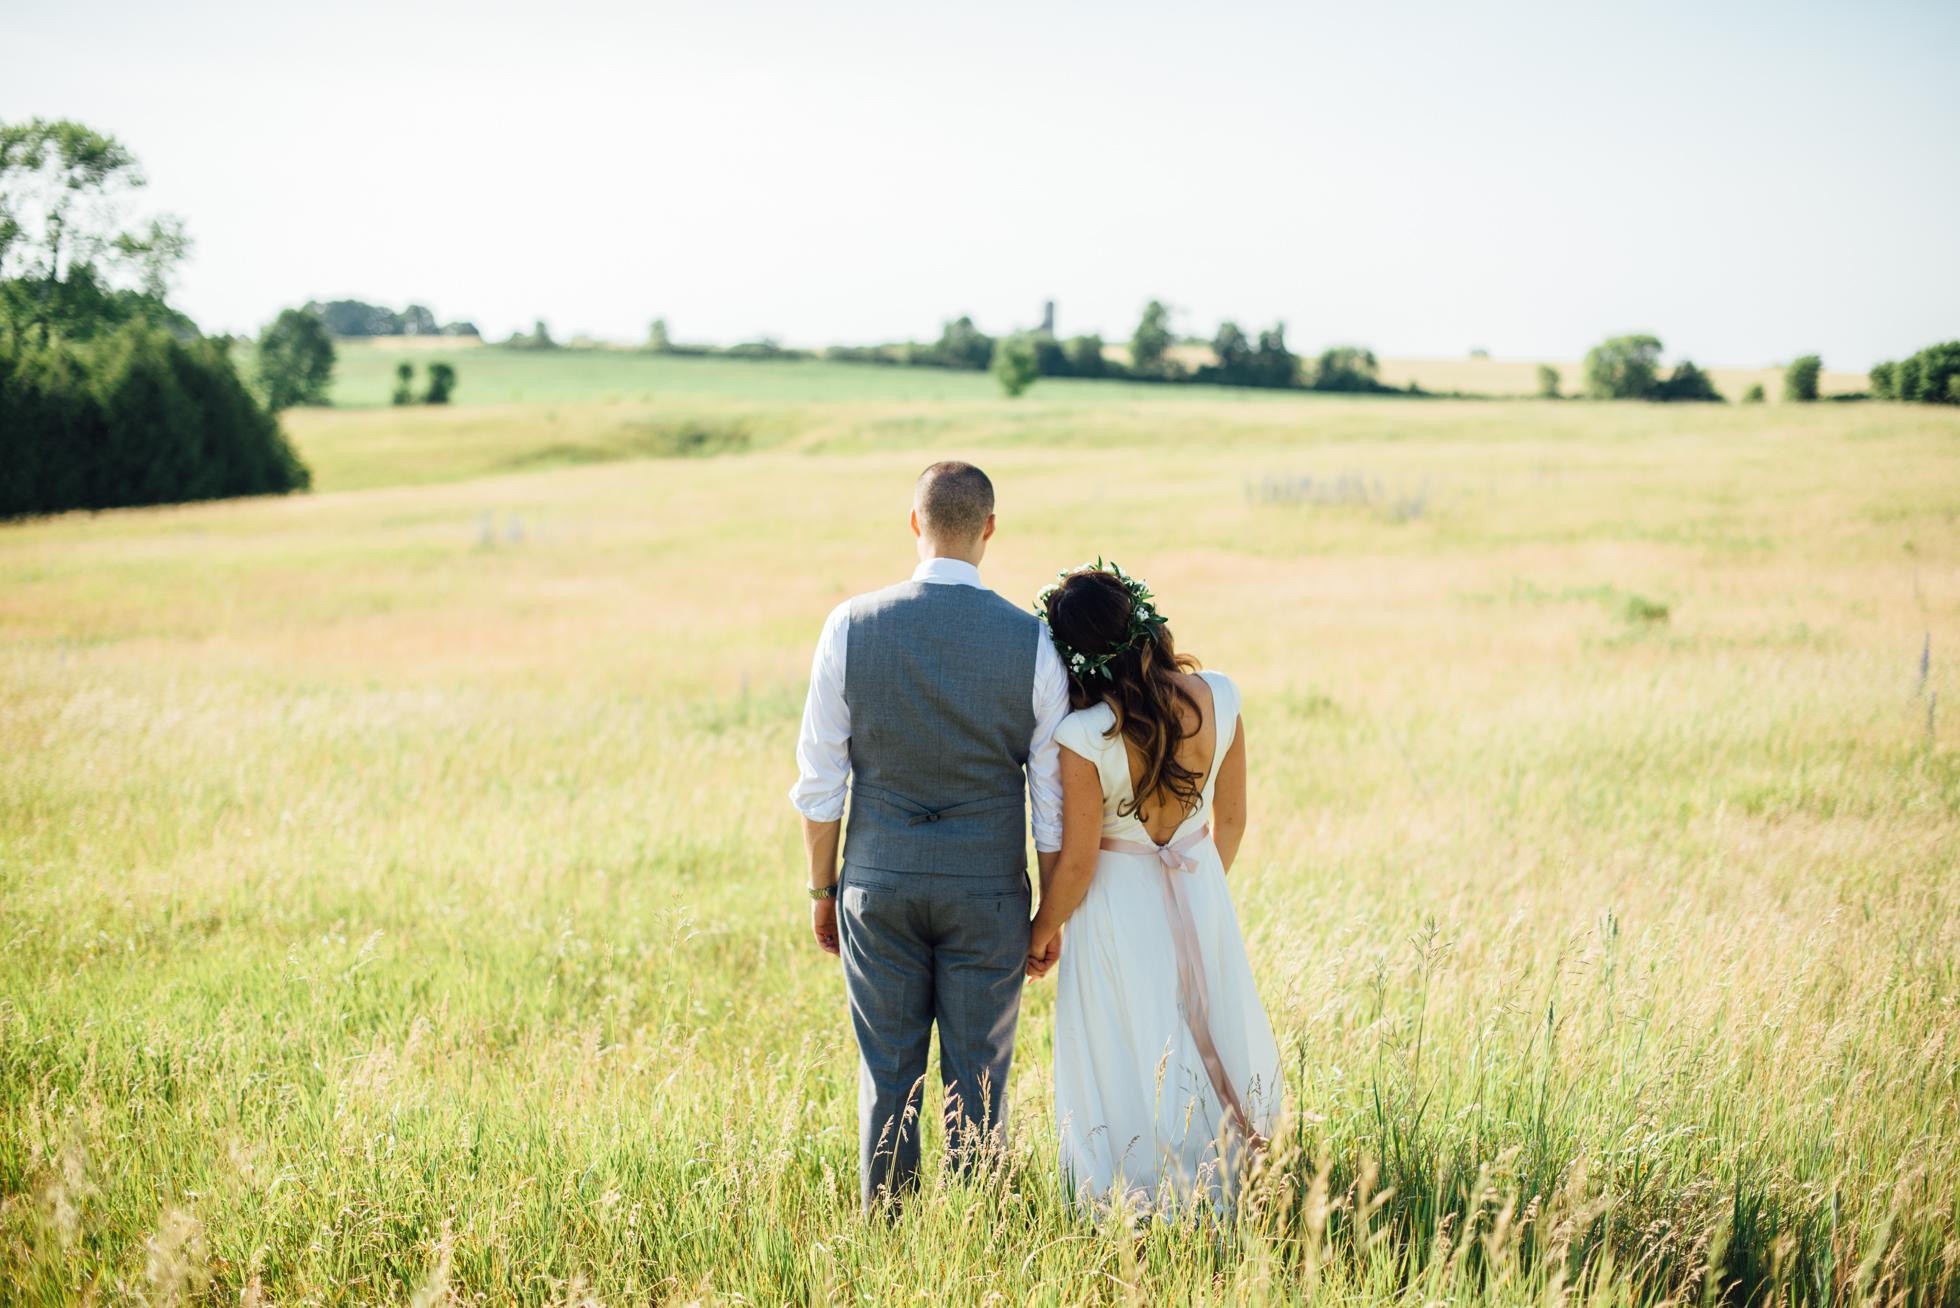 Downswell-Barn-Wedding-Photography-77.jpg